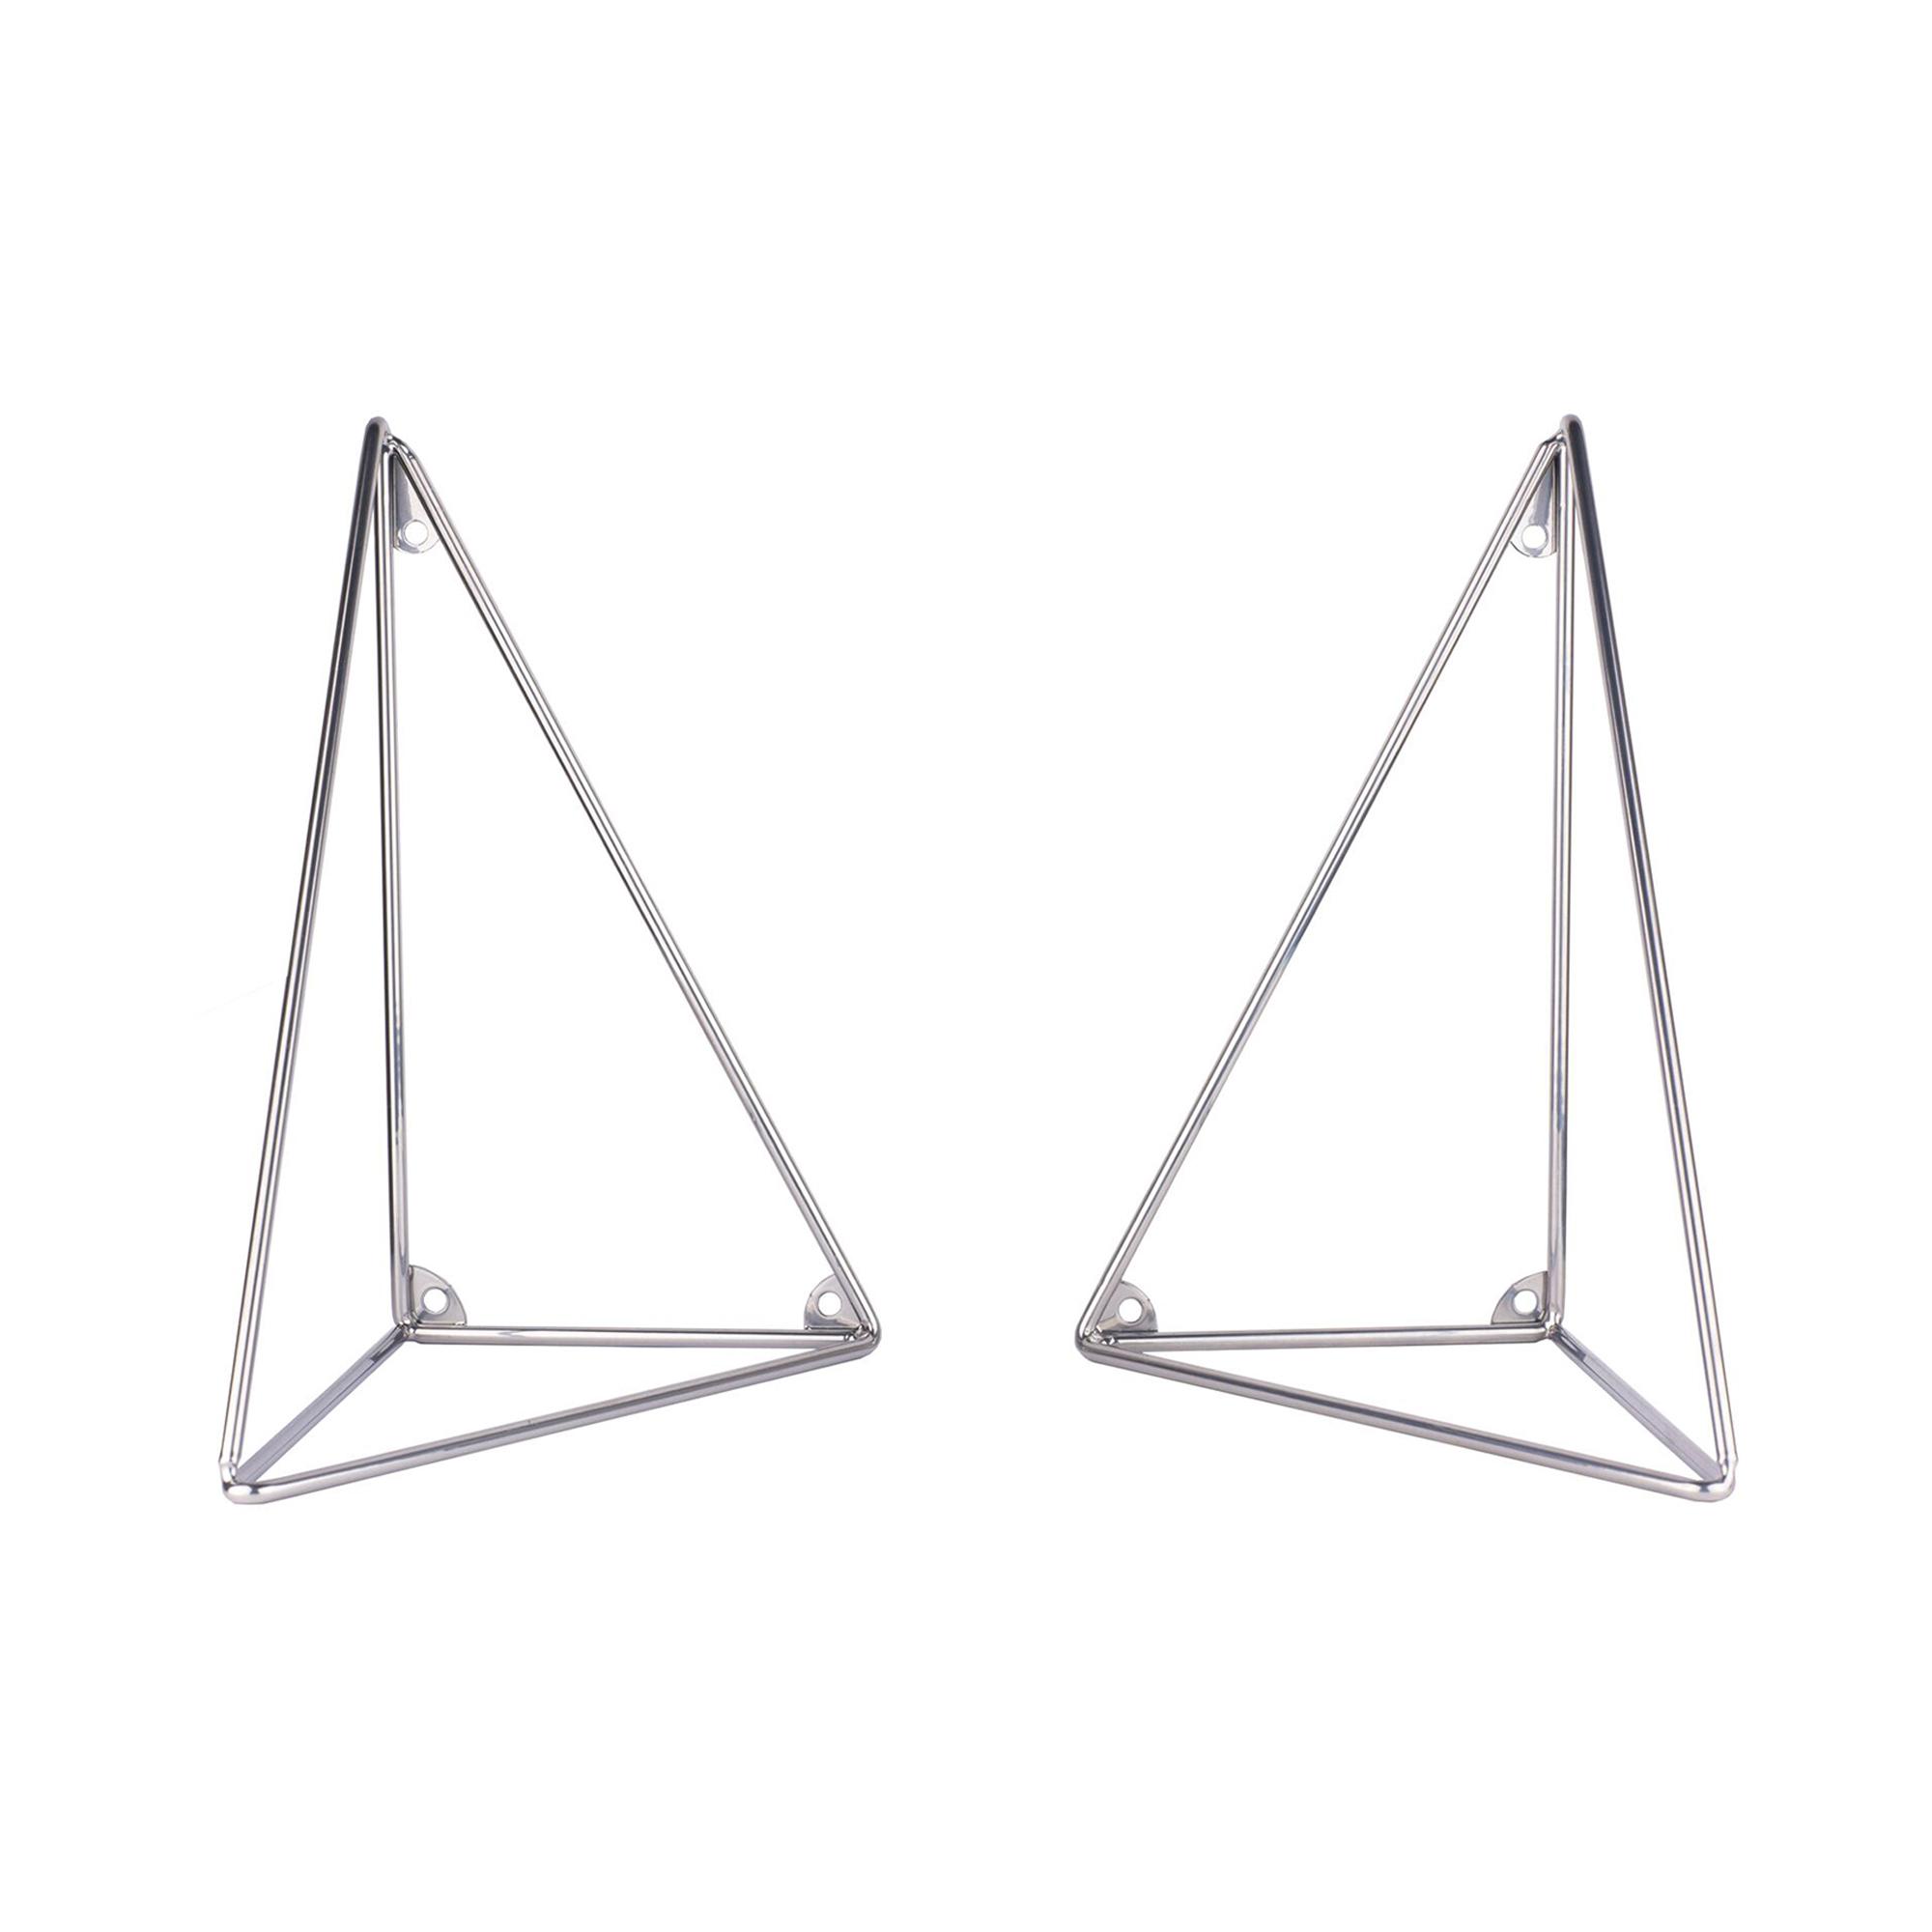 Designtorget Konsol Pythagoras krom 2-p